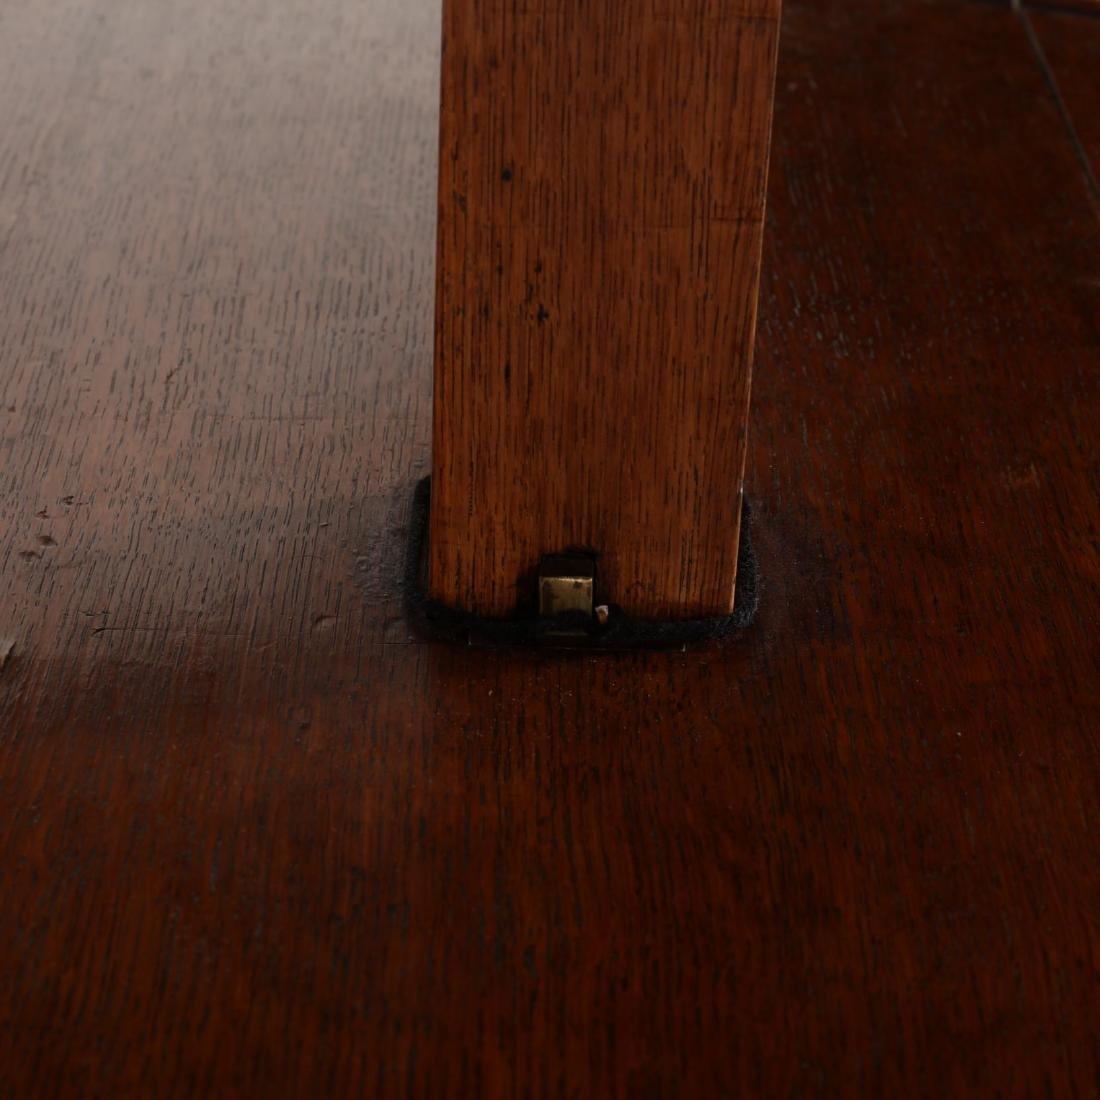 Edwardian Oak Metamorphic Tiered Serving Table - 6